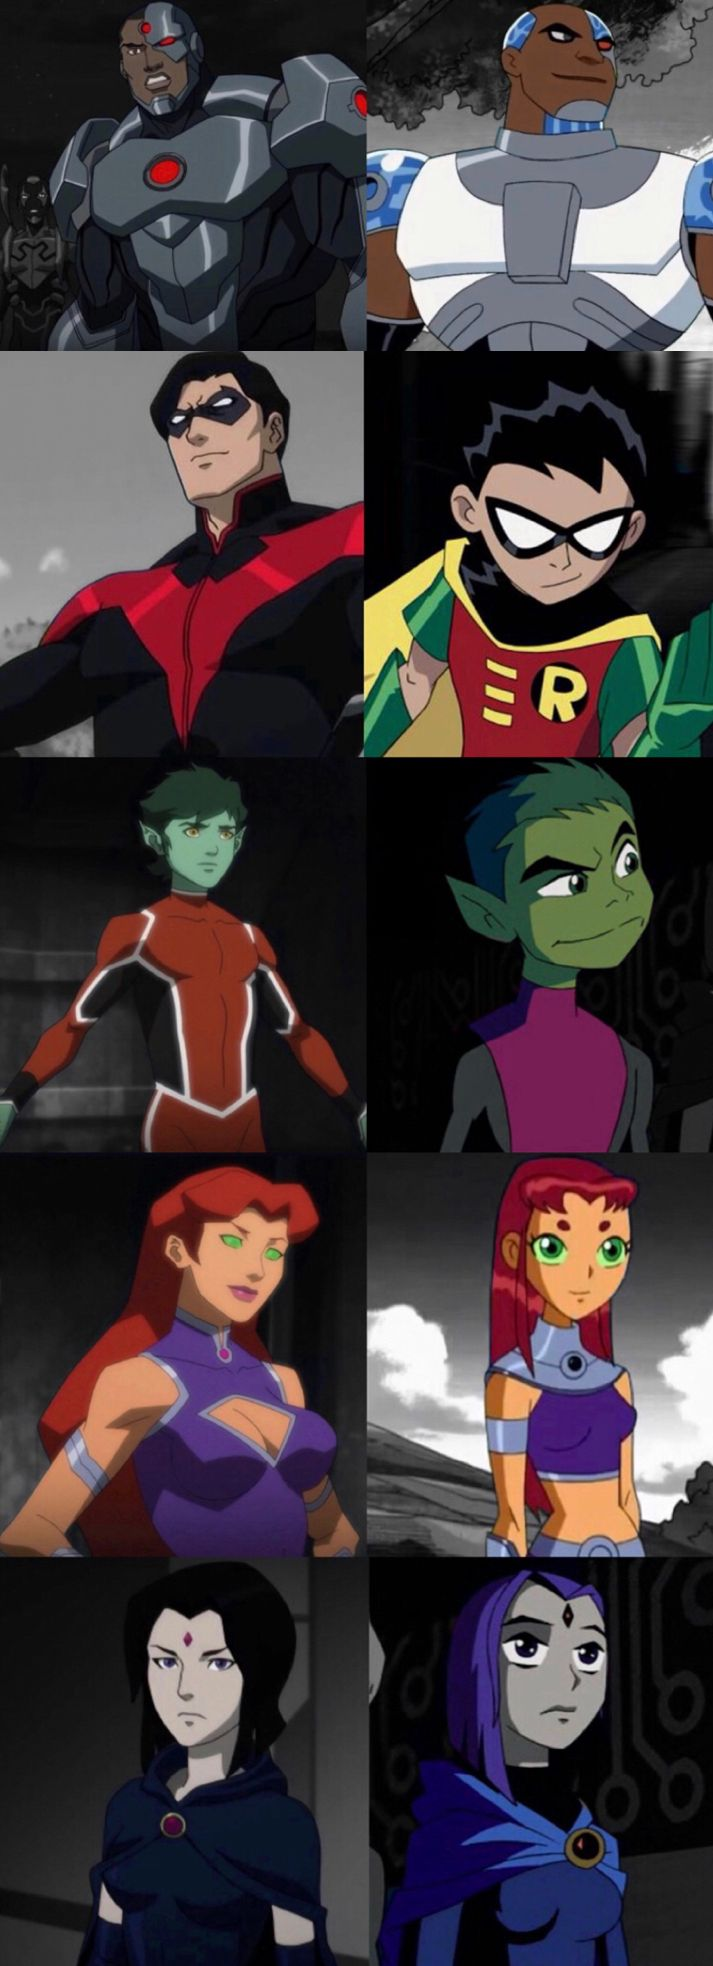 Teen Titans. Cyborg. Robin. Nightwing. Starfire. Raven. Beast Boy.